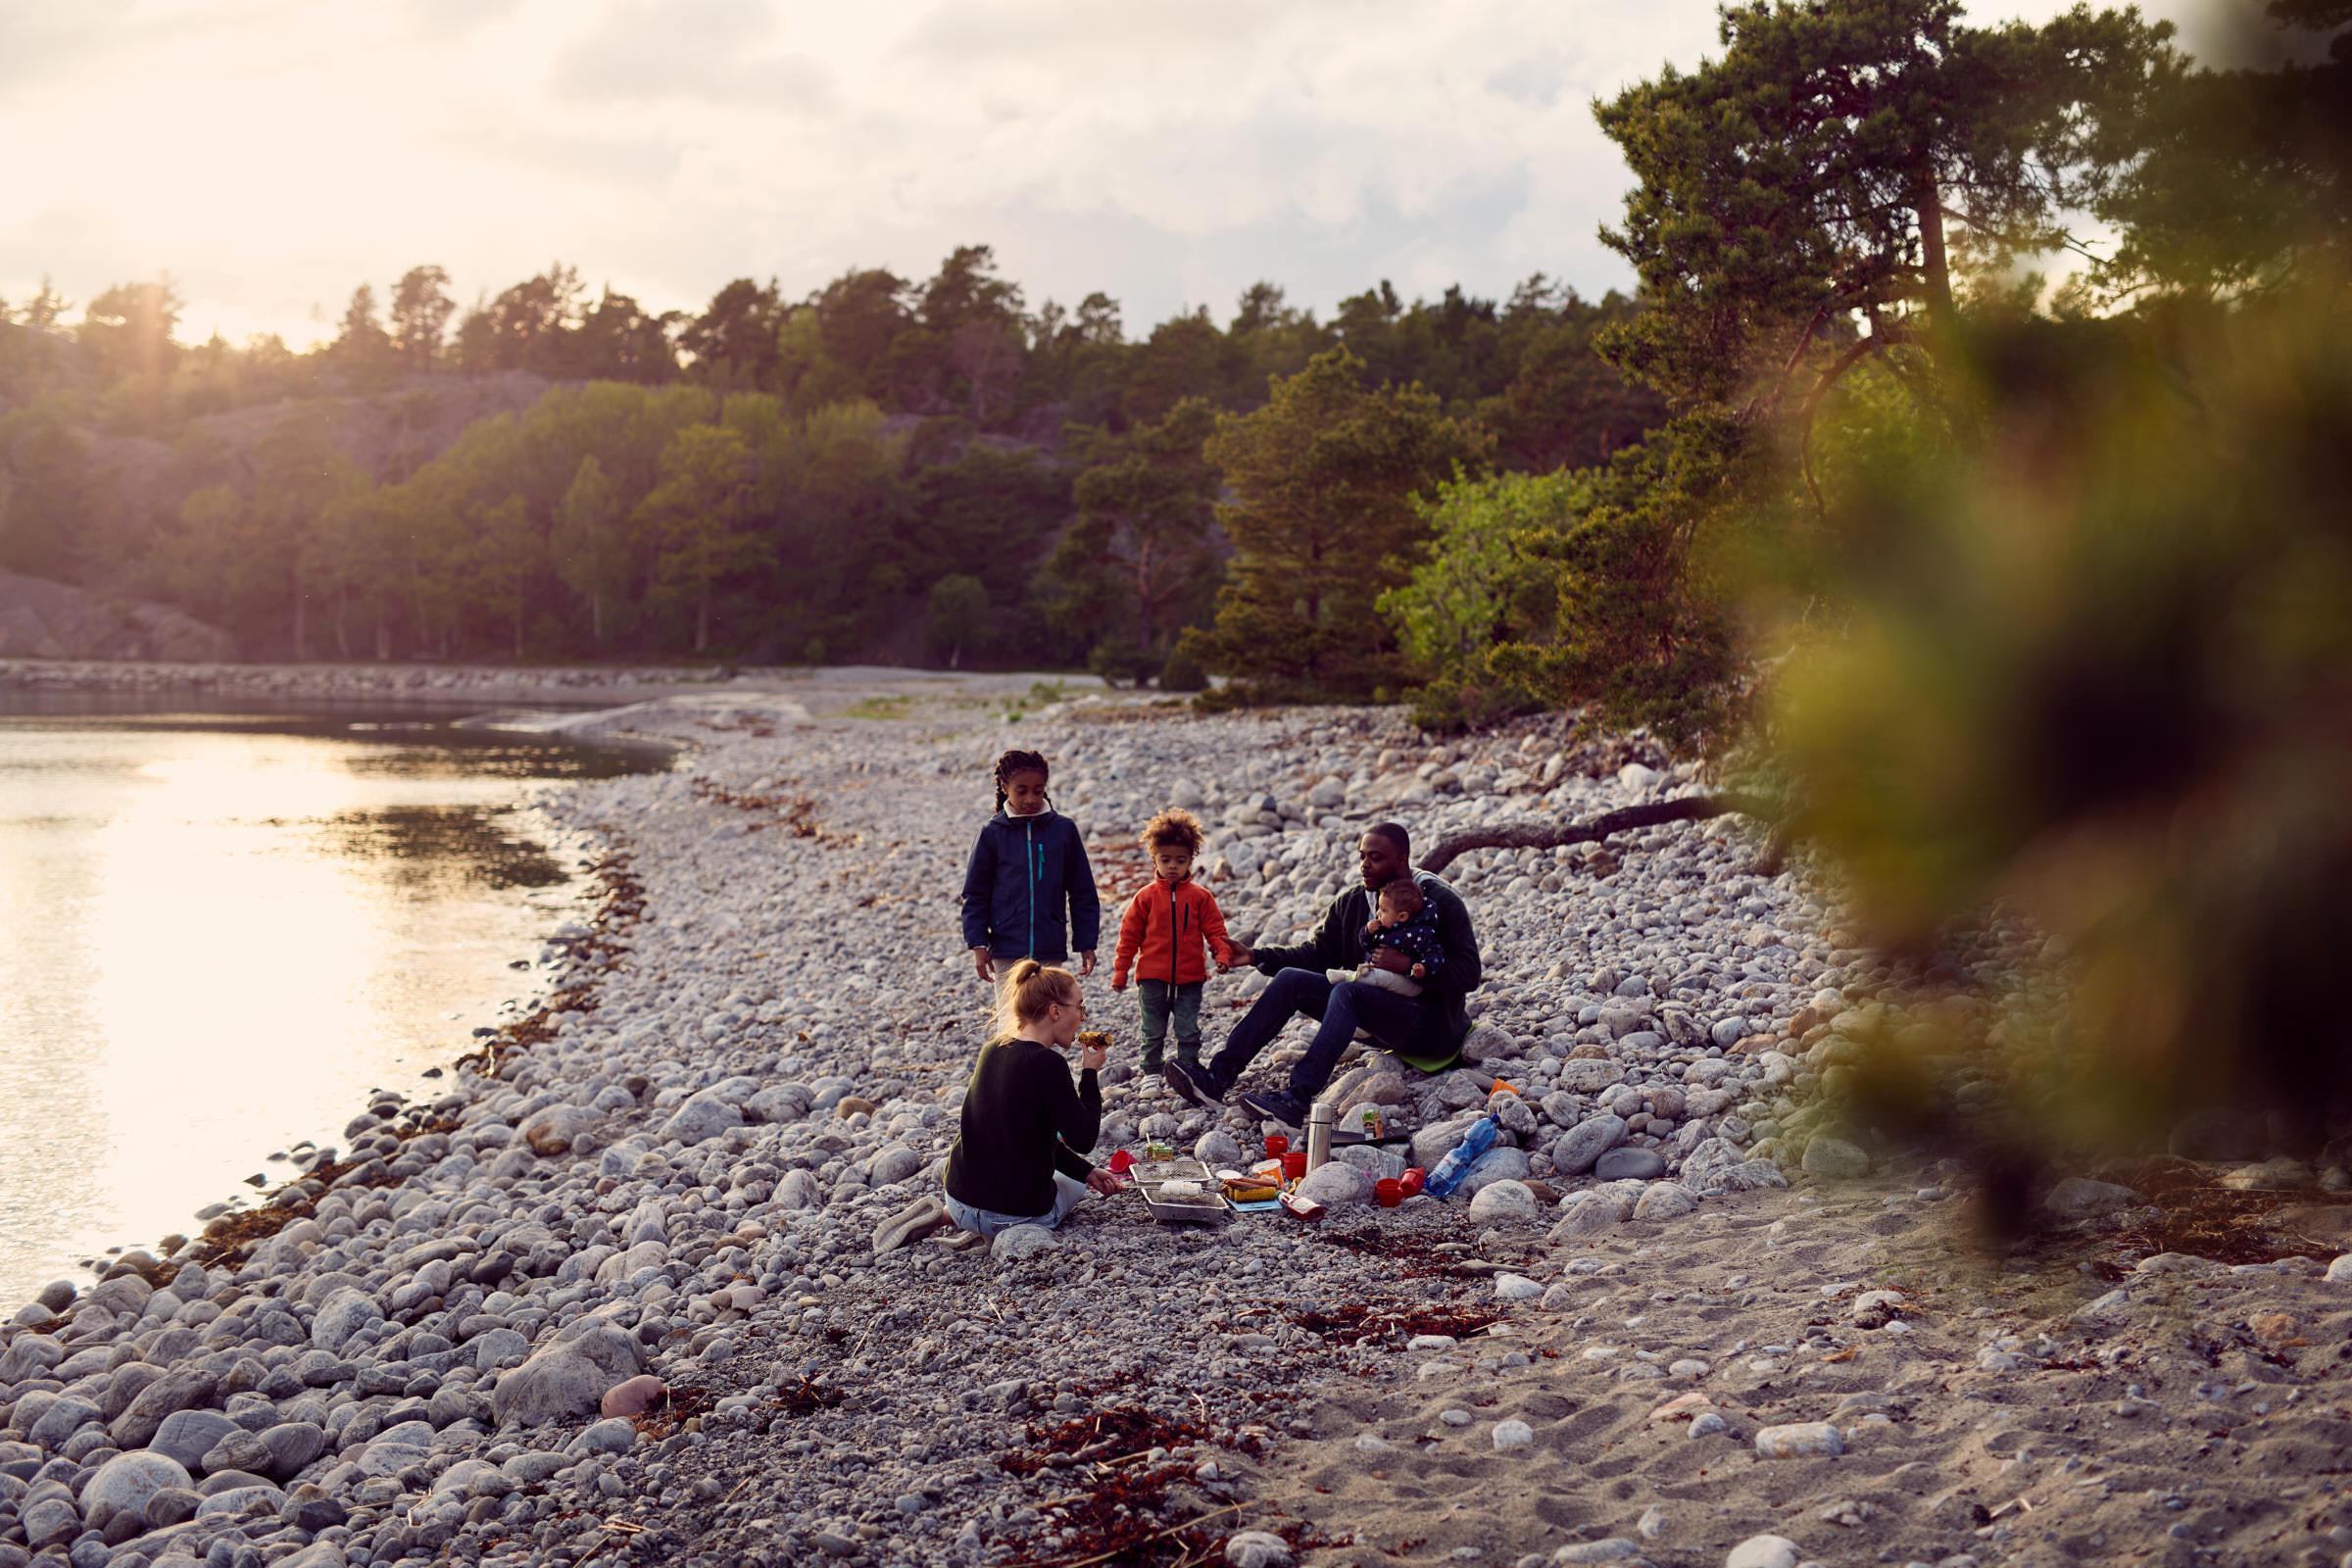 Portfolio_378_Scandinavian Lifestyle__DSC9593_KRISTOFER SAMUELSSON PHOTOGRAPHY.jpg